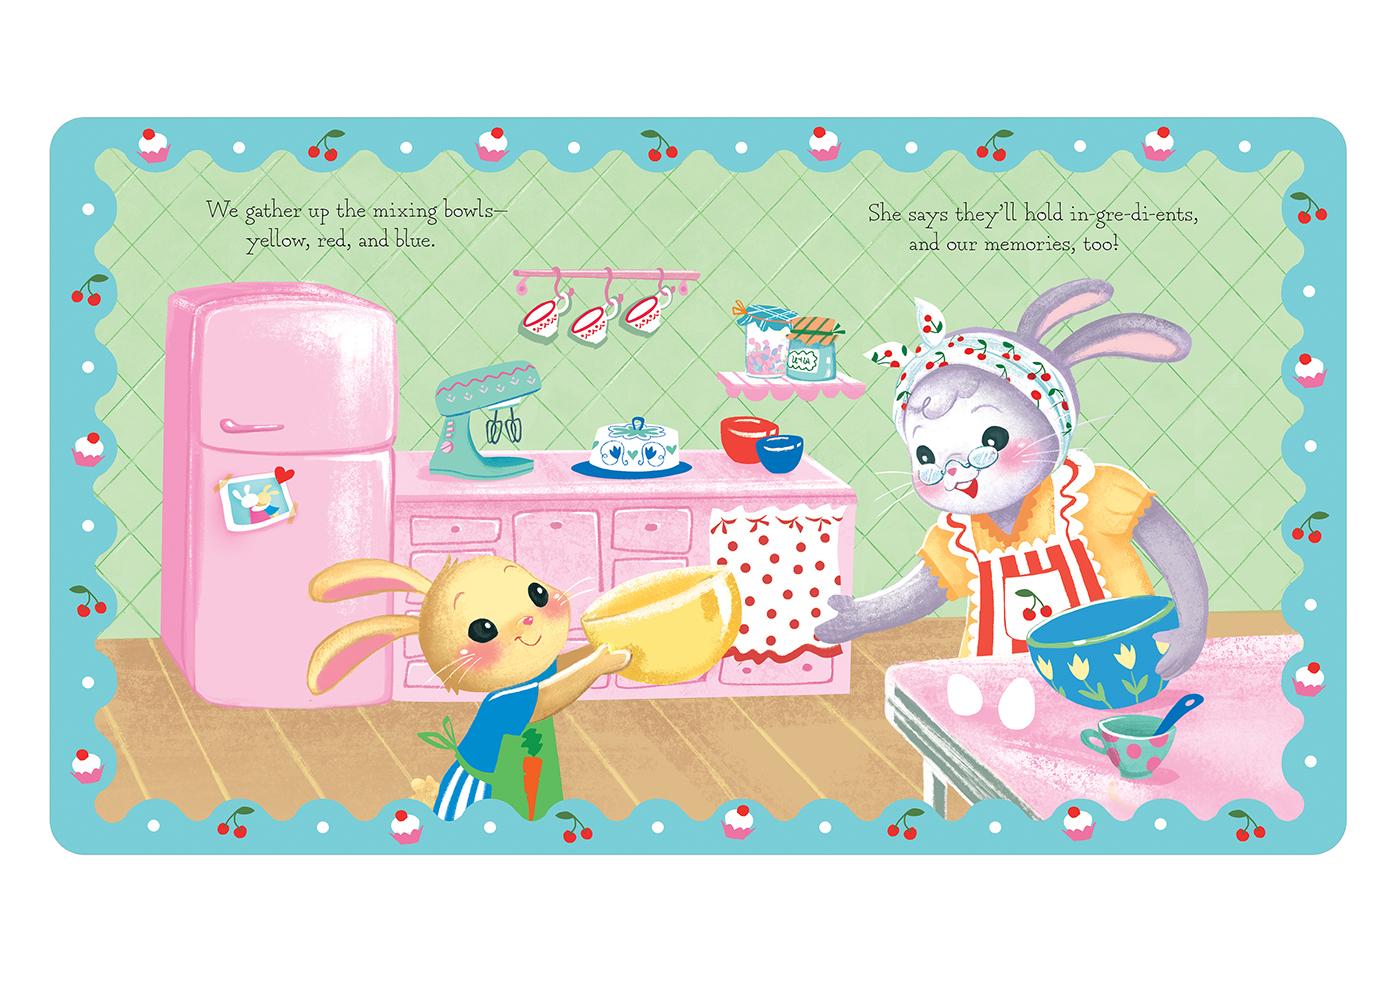 children's book Love grandma ILLUSTRATION  children 50's style cooking animals Character design  digital illustration